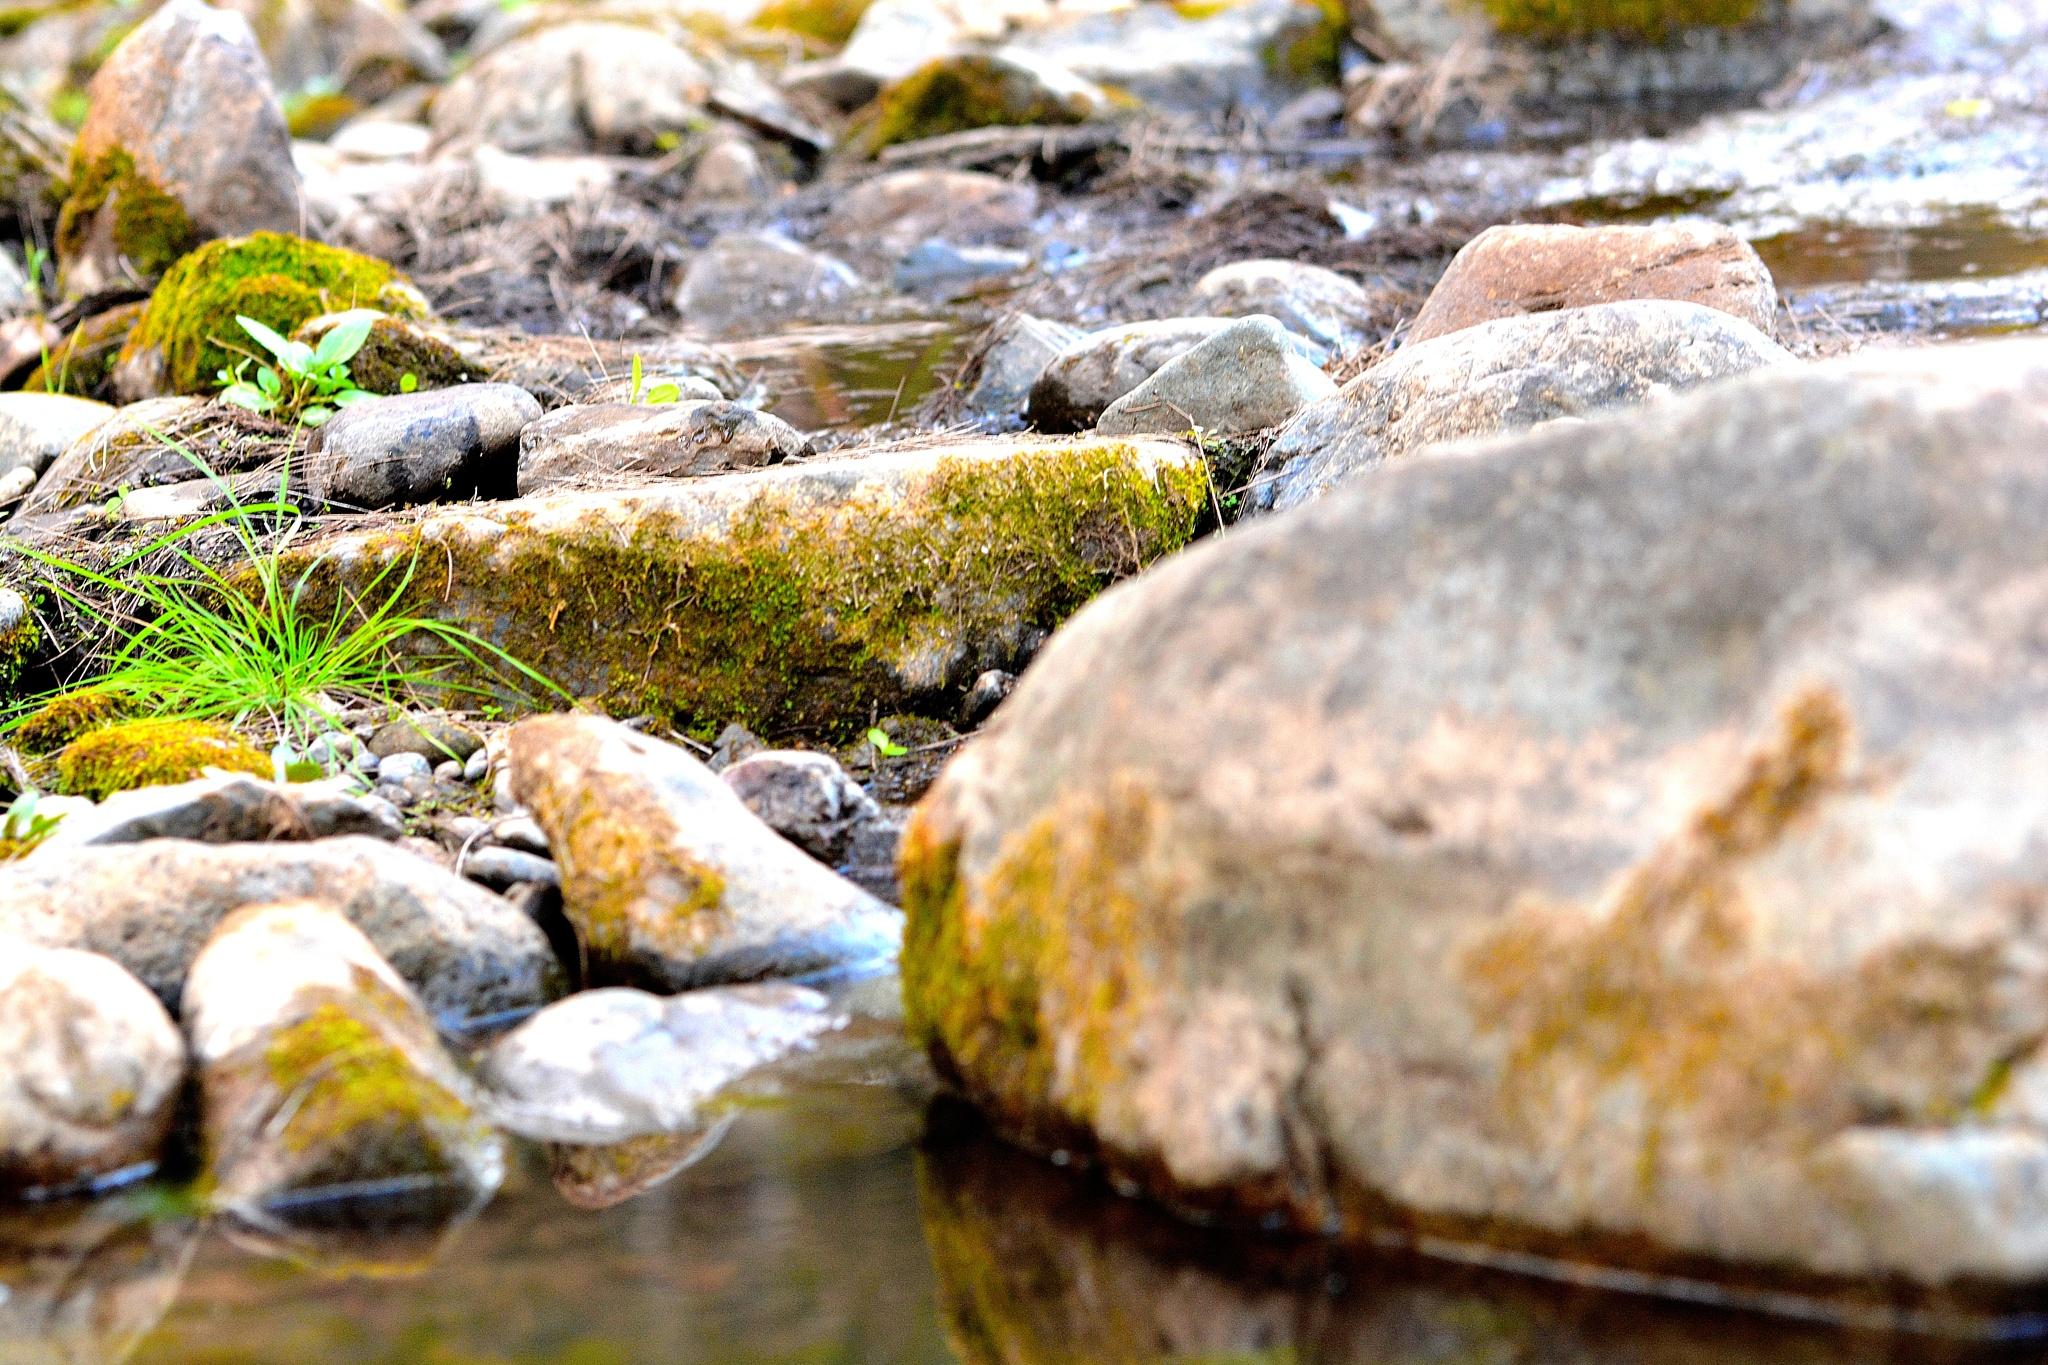 Closeup of a very rocky river by valli.hemp